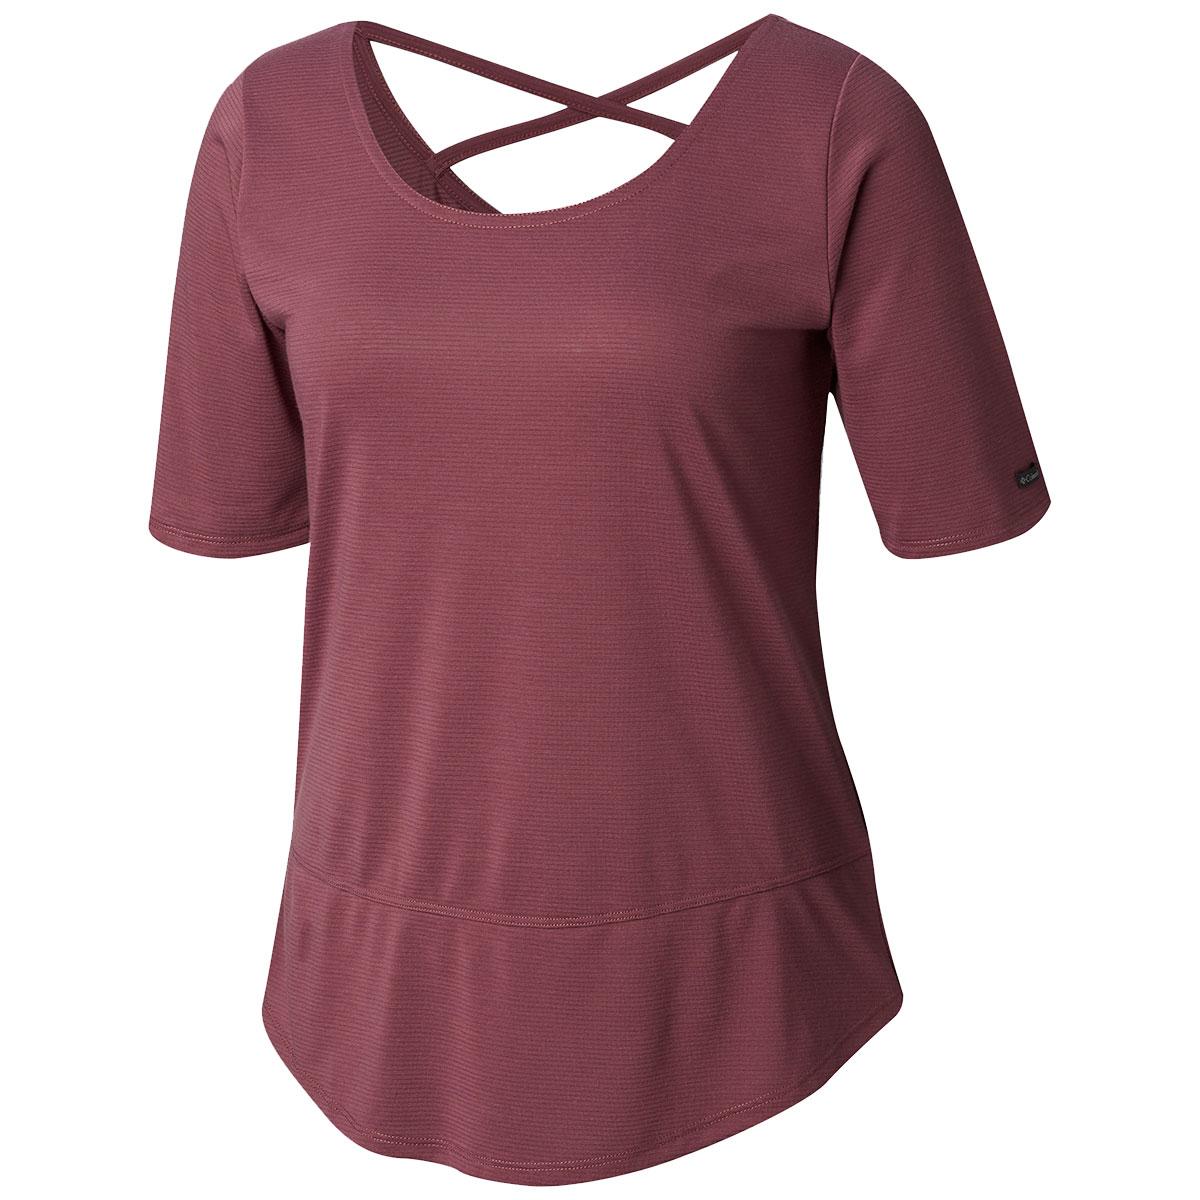 Columbia Women's Anytime Casual Short-Sleeve Shirt - Purple, M